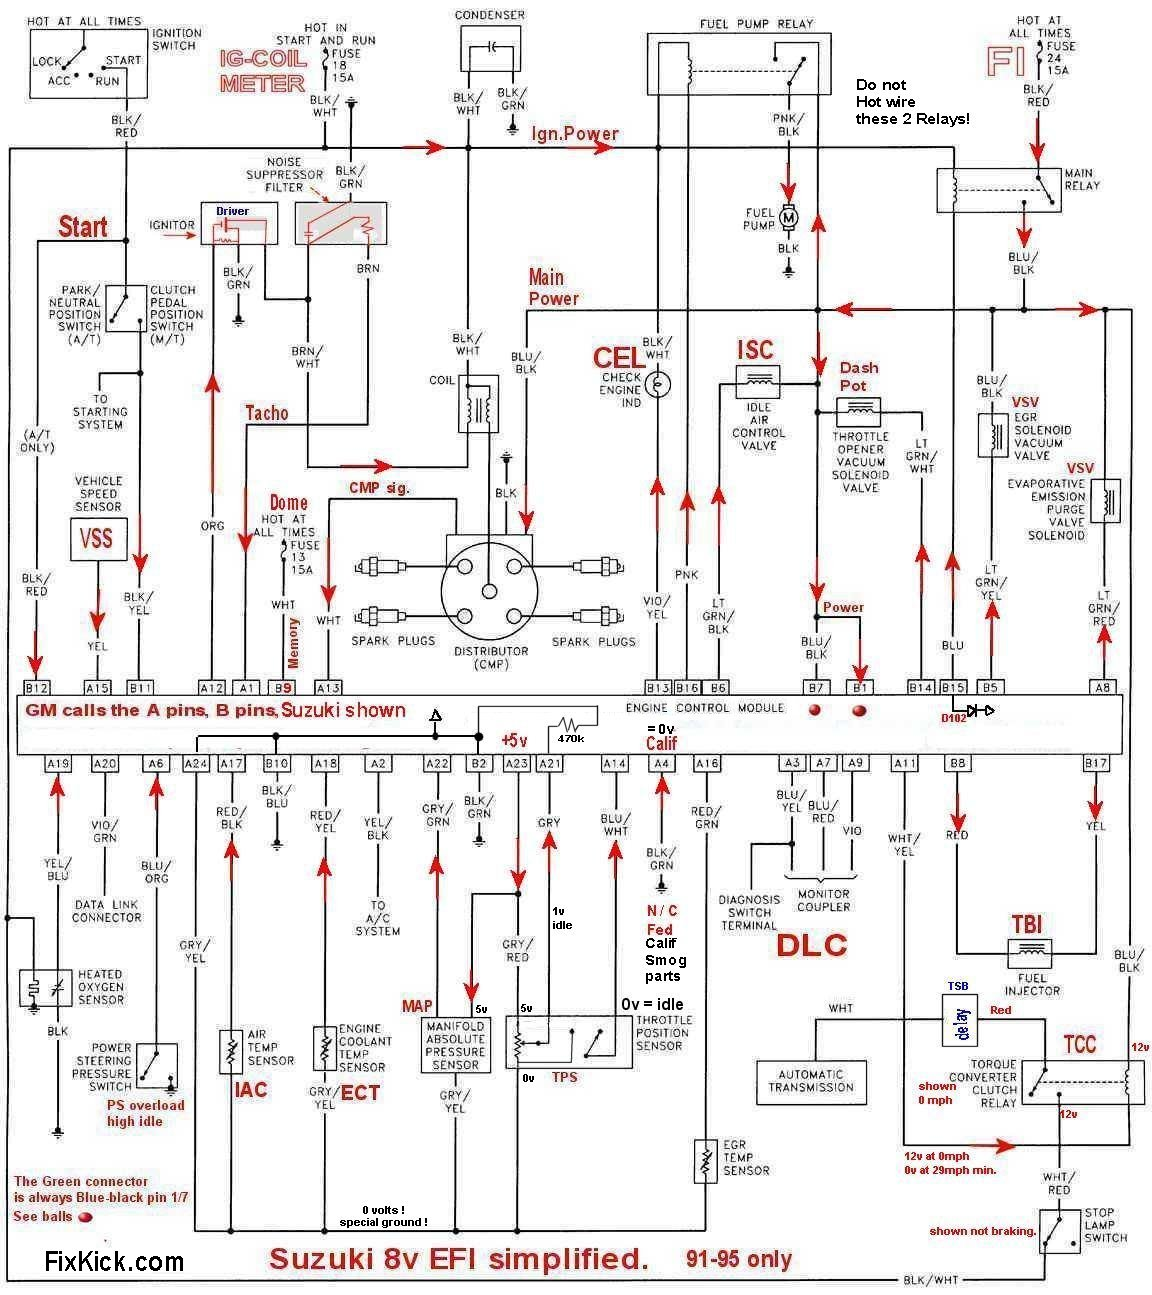 OK_7494] 1995 Suzuki Sidekick Engine Wiring Diagram Further Suzuki Sidekick Schematic  WiringIttab Oxyt Bocep Vira Phae Mohammedshrine Librar Wiring 101